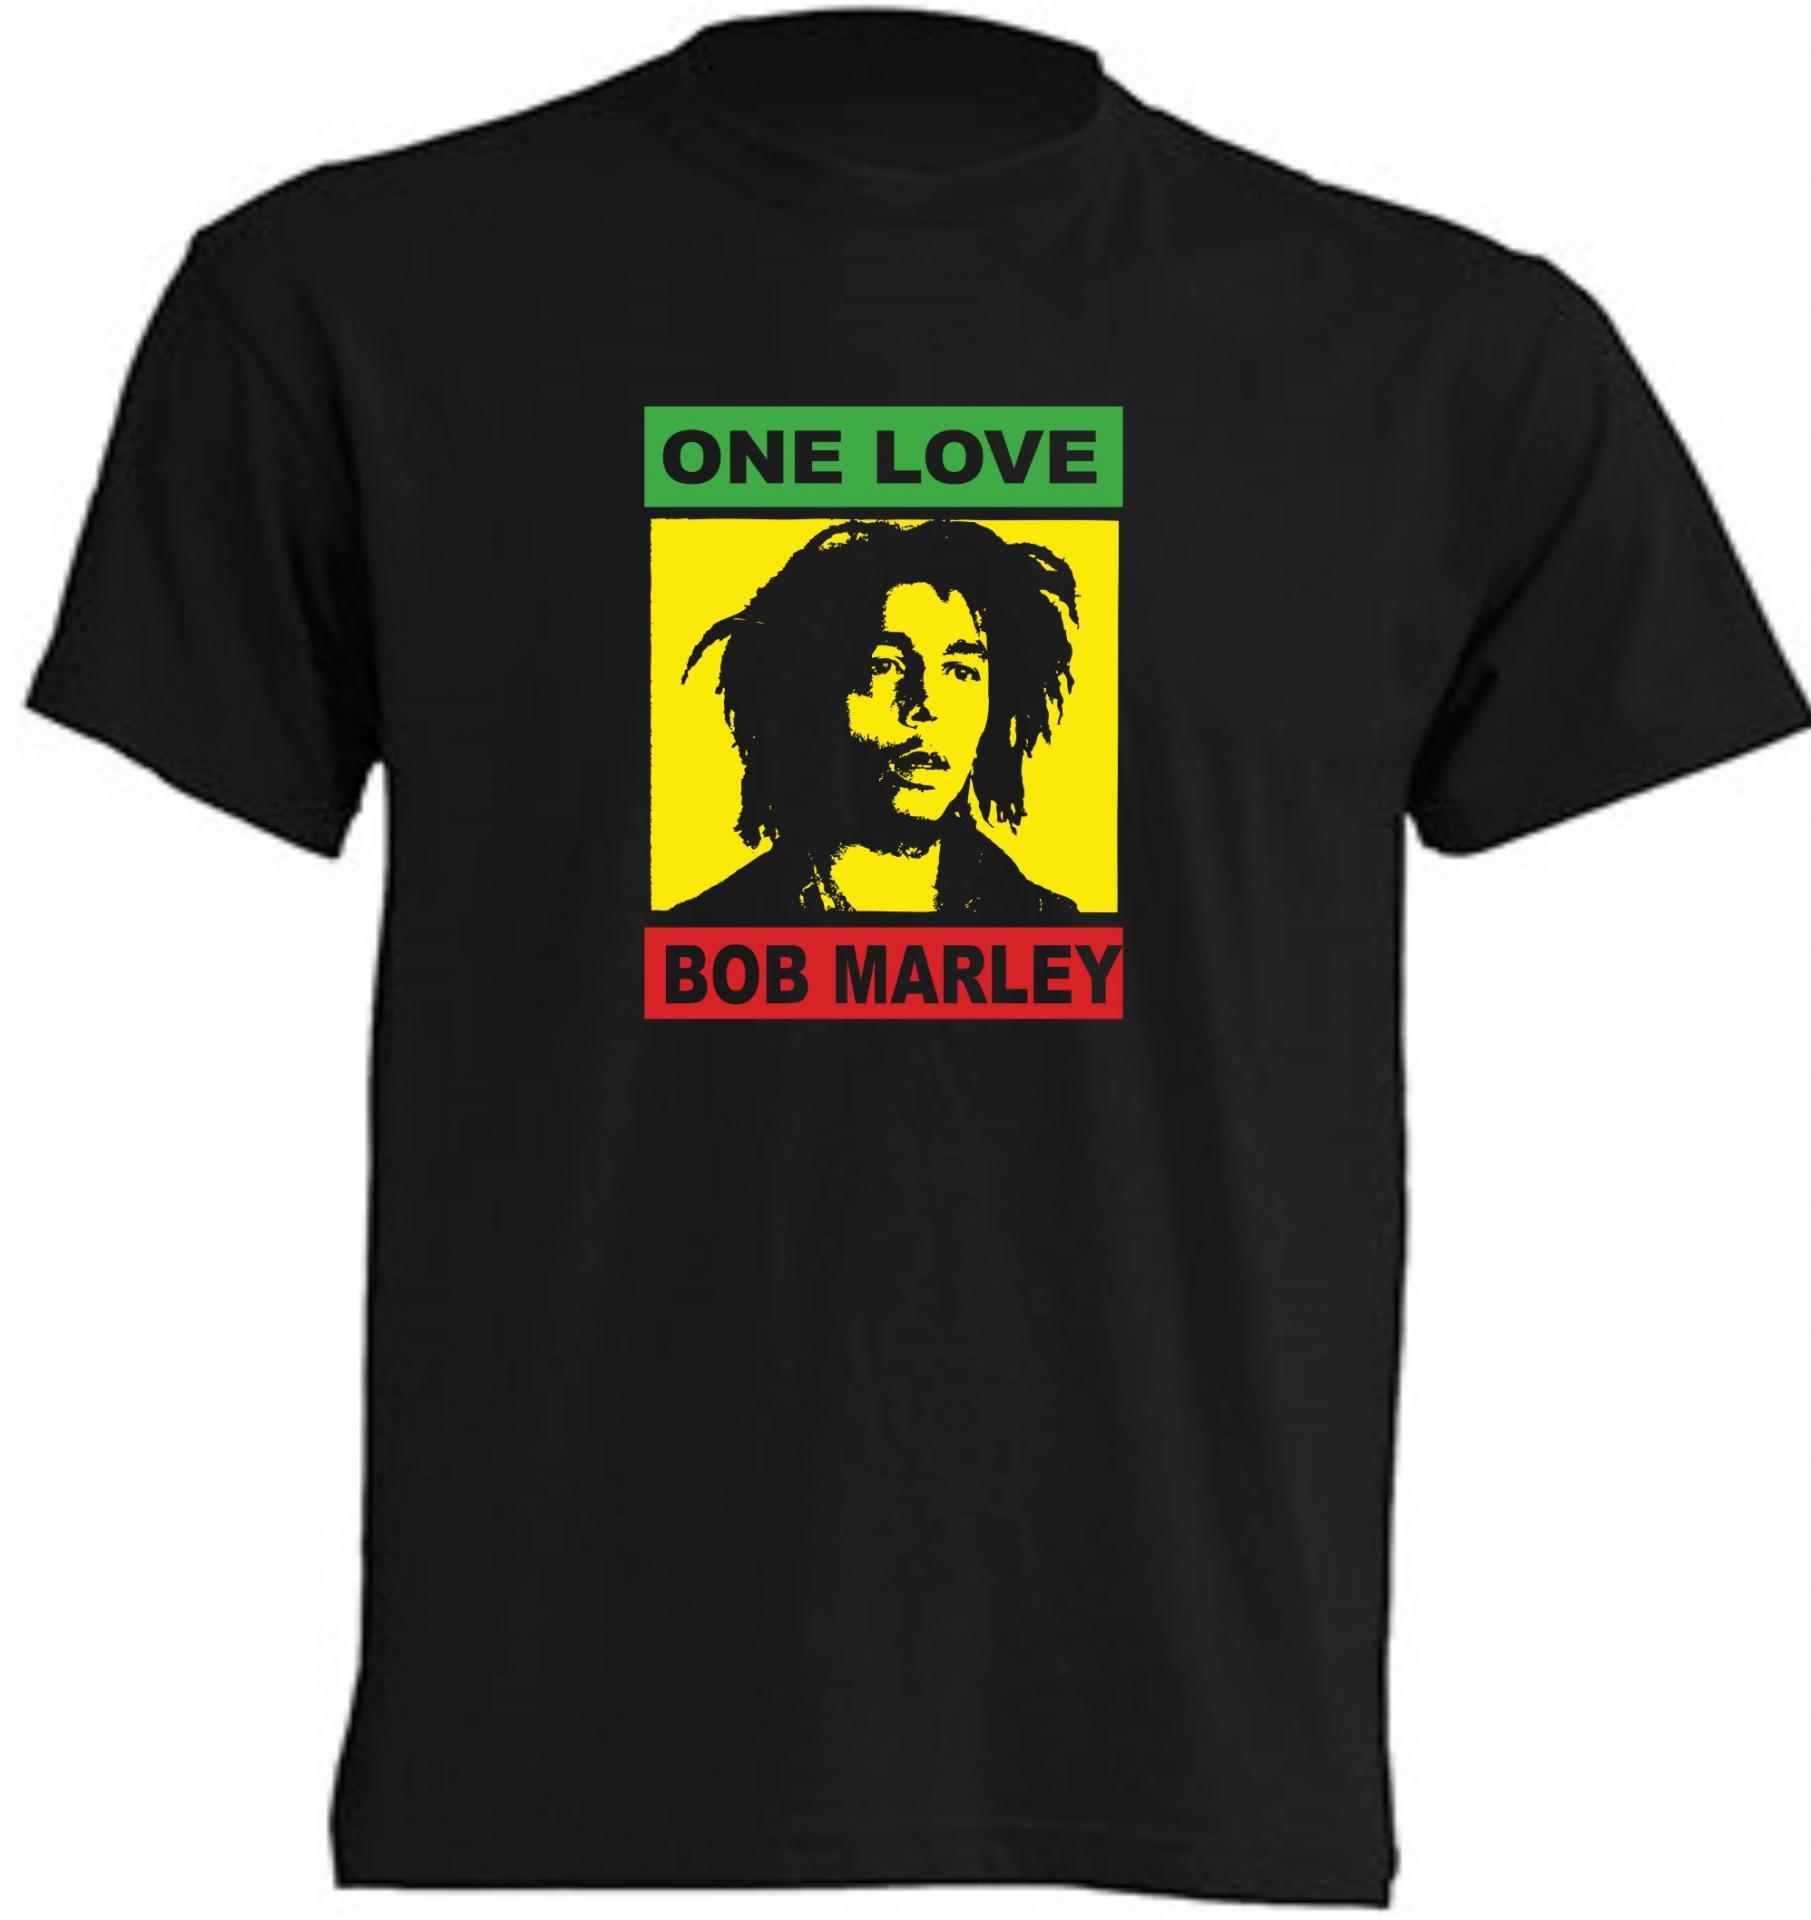 CAMISETA ONE LOVE BOB MARLEY